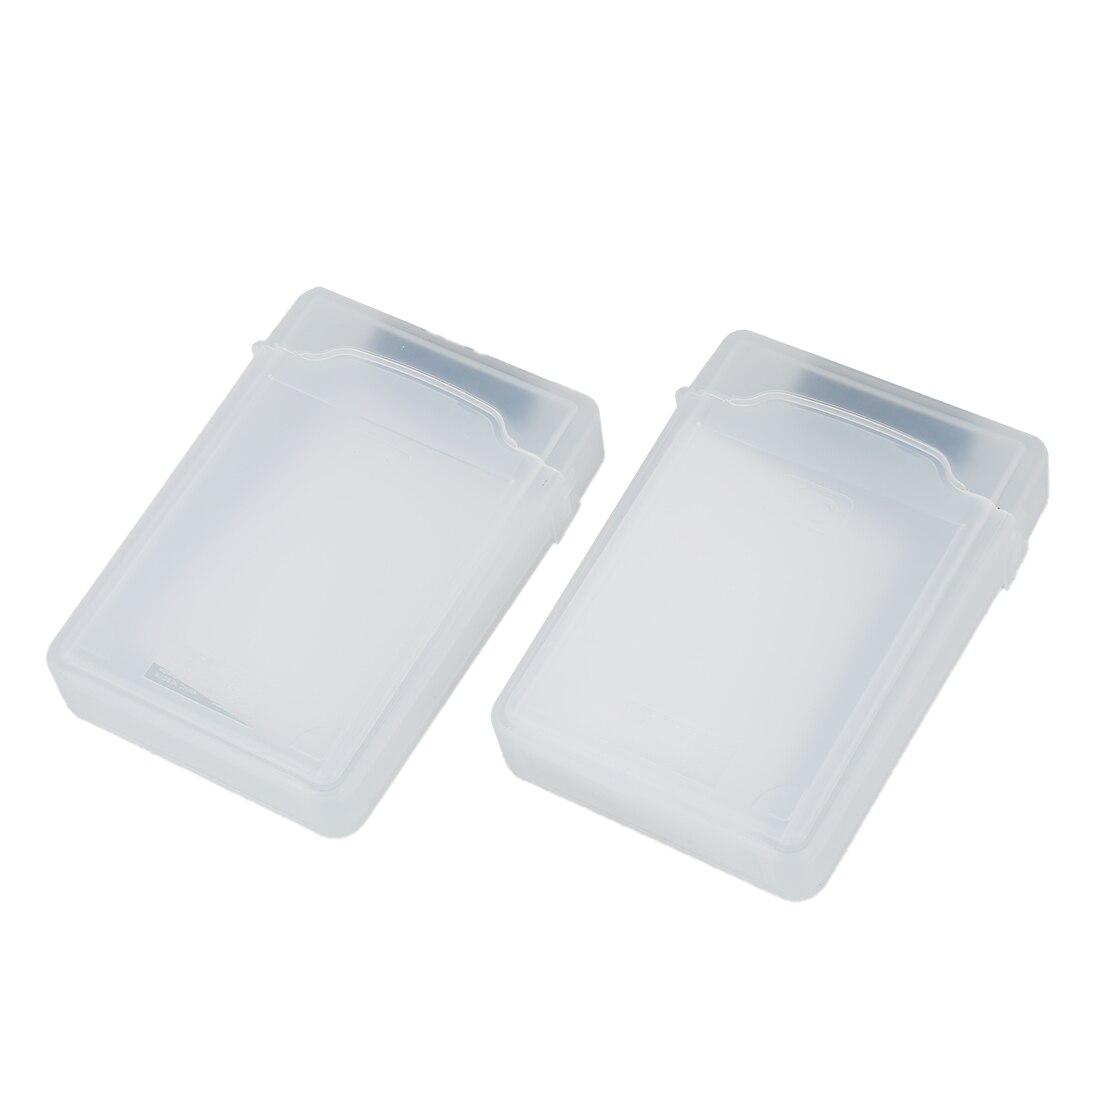 2 Packs Klar 3,5 Zoll Sata Hdd Festplatte Lagerung Fall